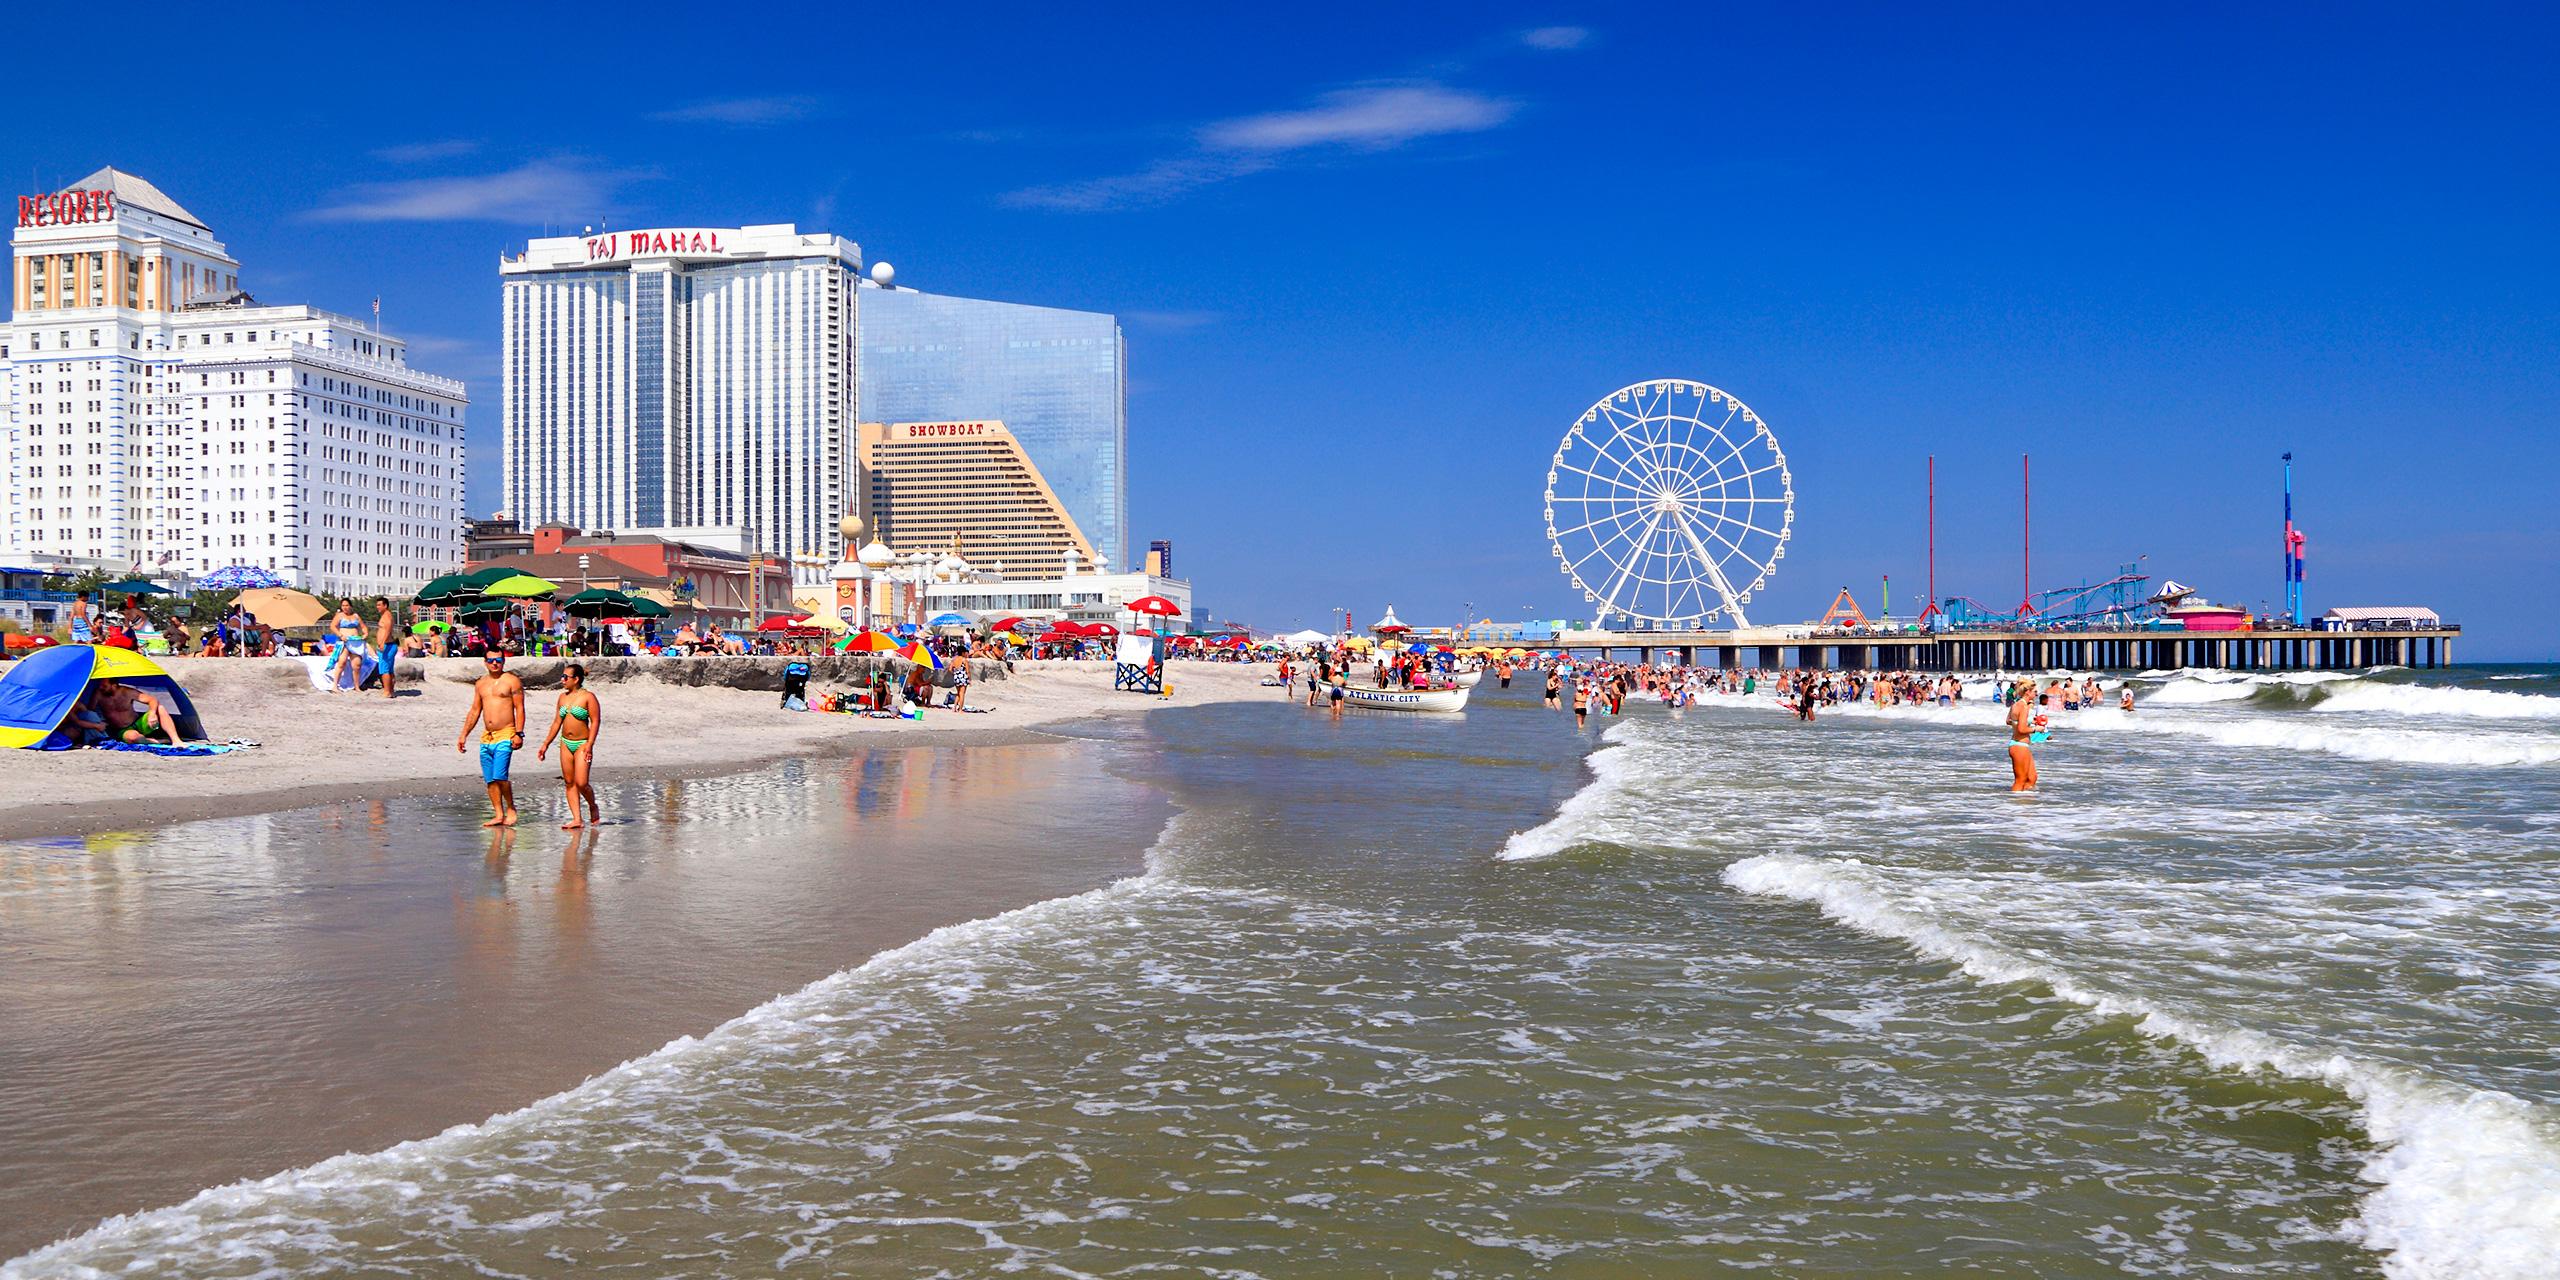 Beach and Steel Pier in Atlantic City; Courtesy Vlad G/Shutterstock